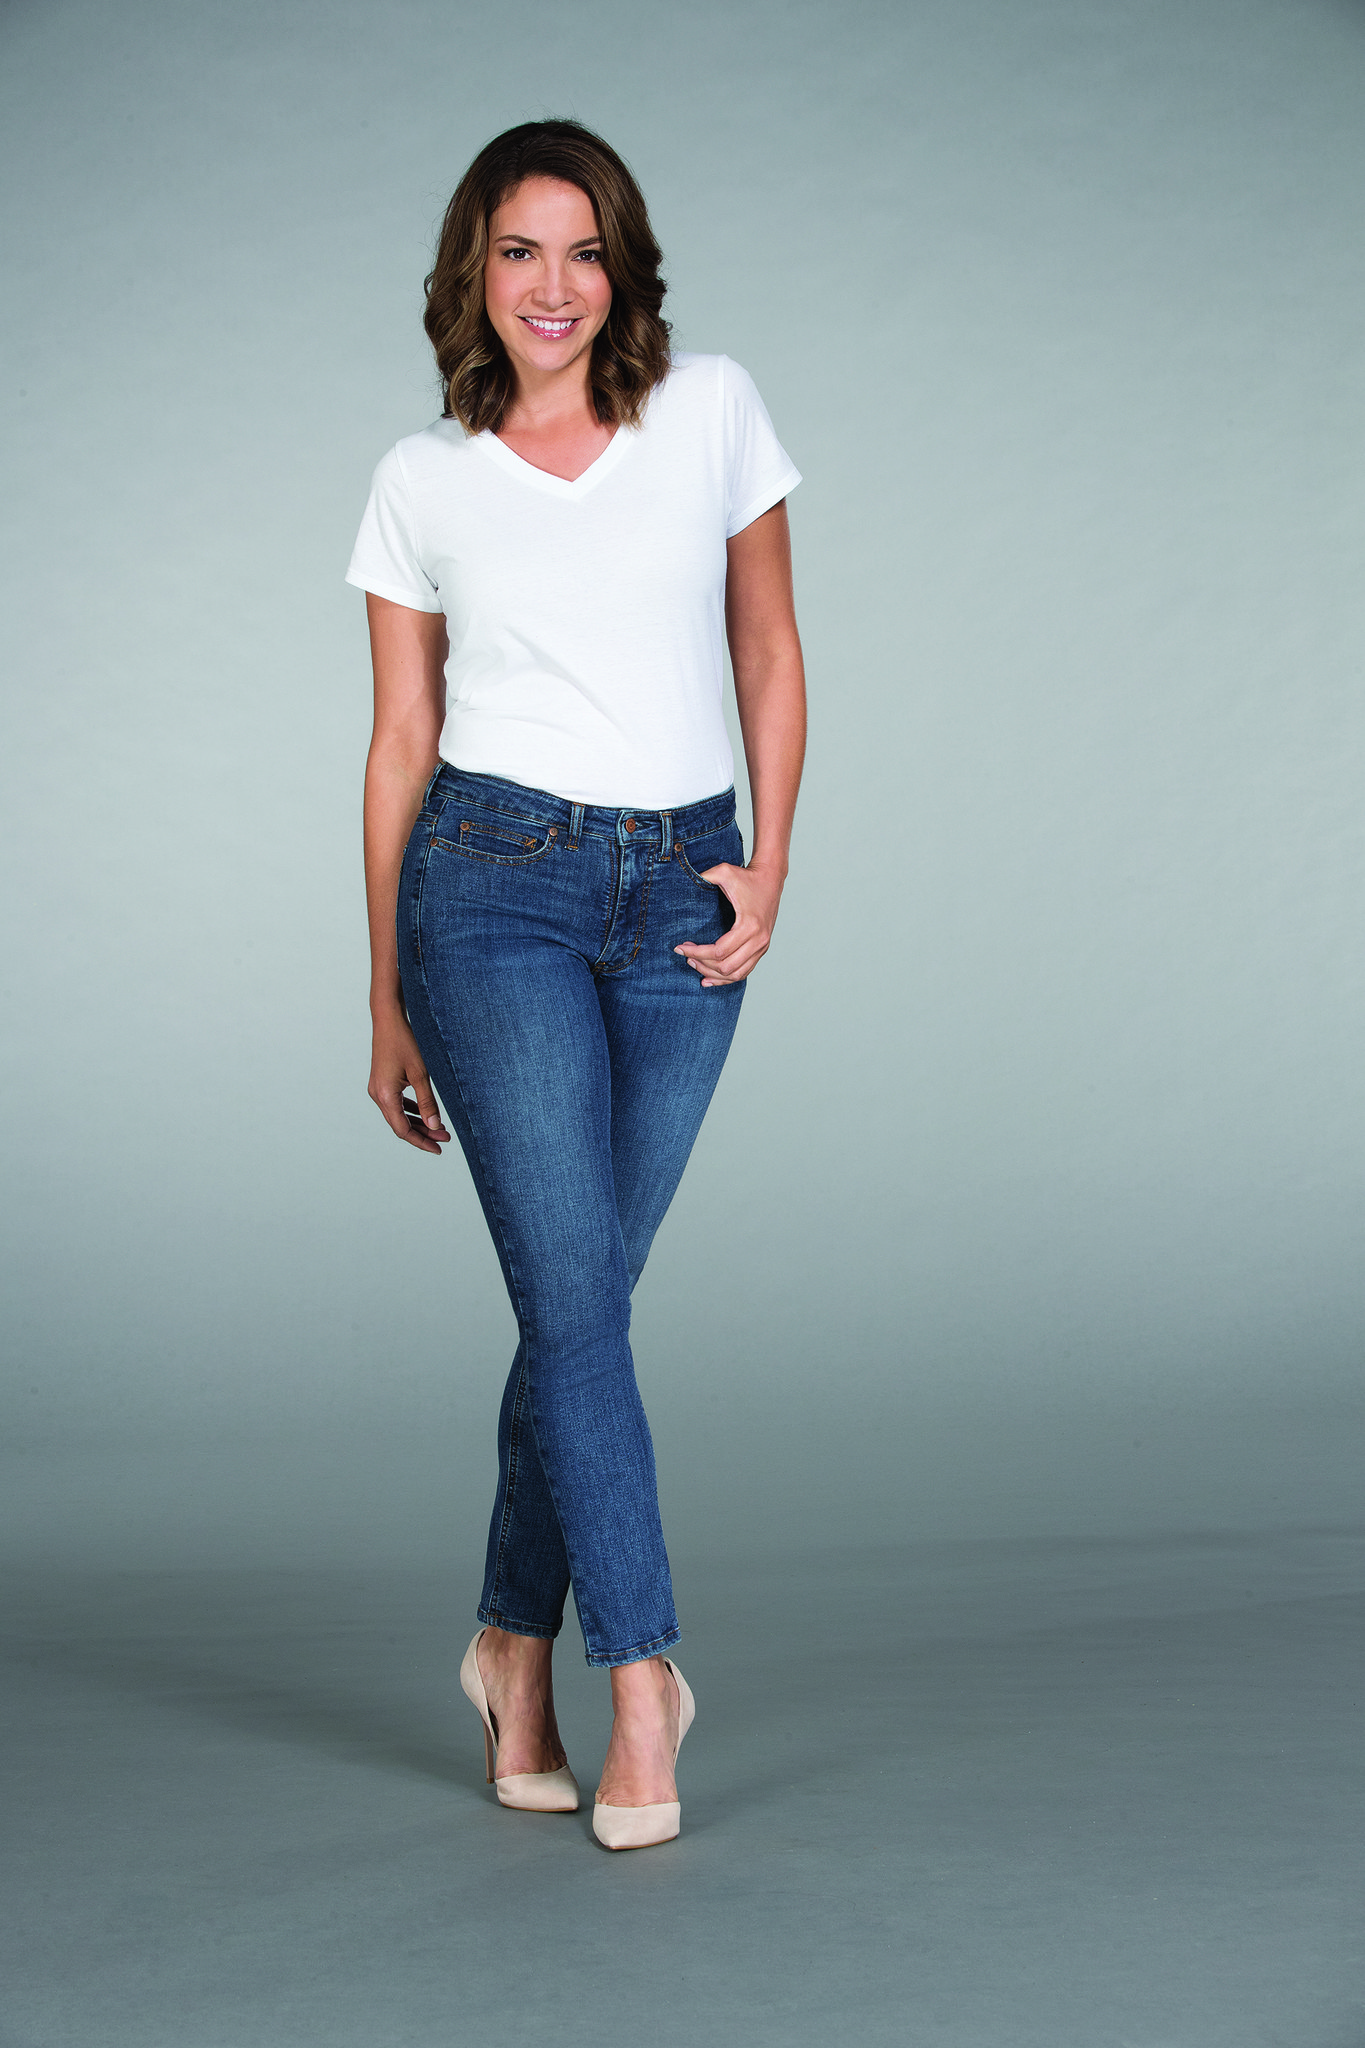 New denim shape wear from workwear brand Dickies.